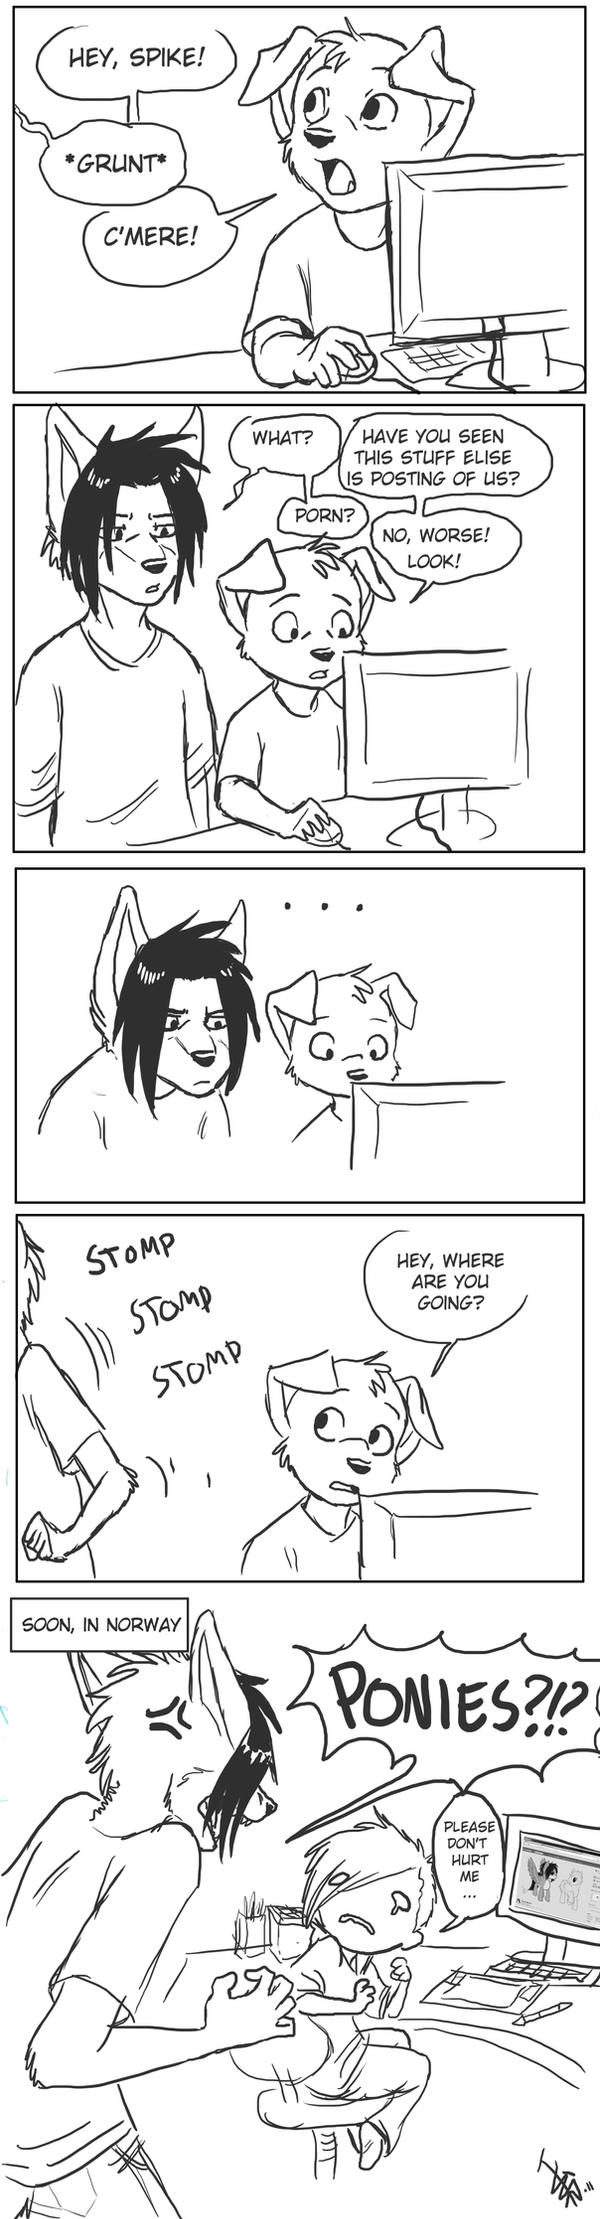 Spike's reaction by oomizuao